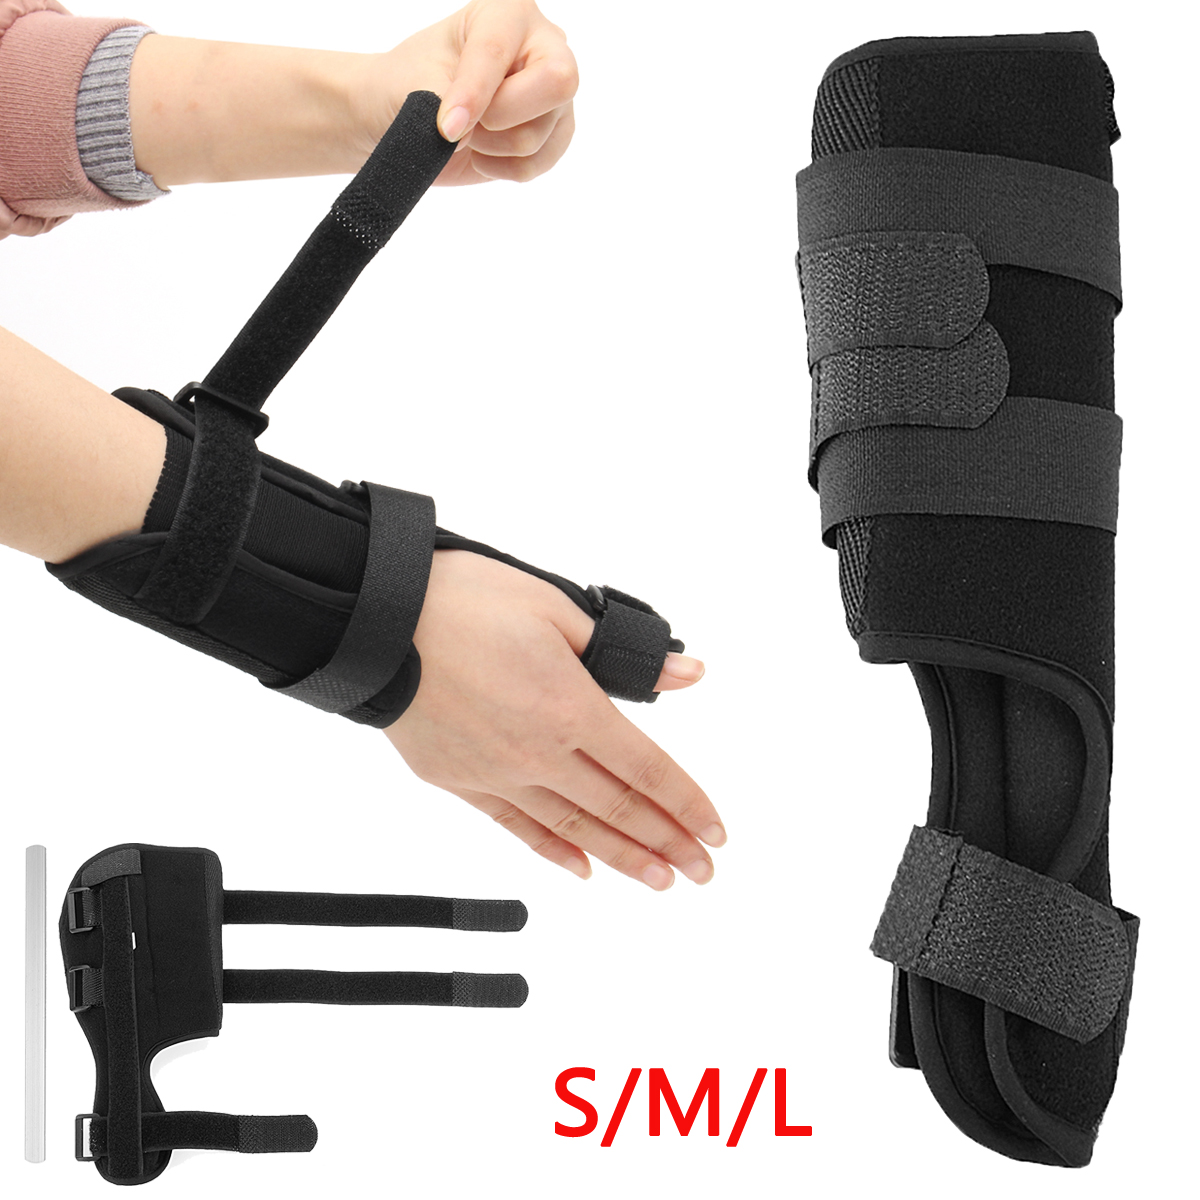 Thumb Spica Wrist Splint Brace Support Sports Strap Stabiliser Arthritis Injury Correction Finger Pain Splint Protection Tendon